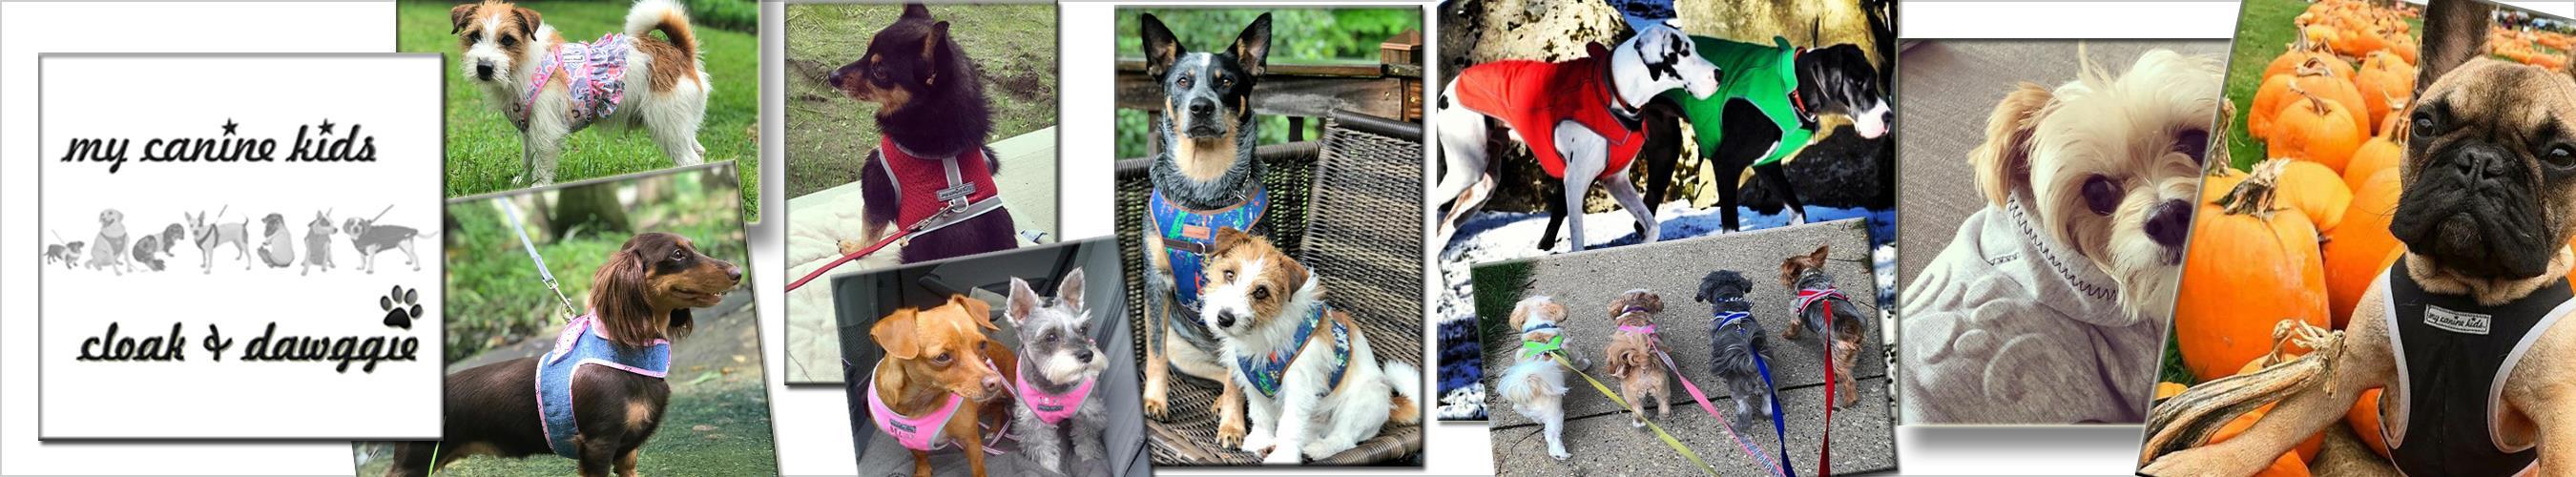 My Canine Kids - Cloak + Dawggie